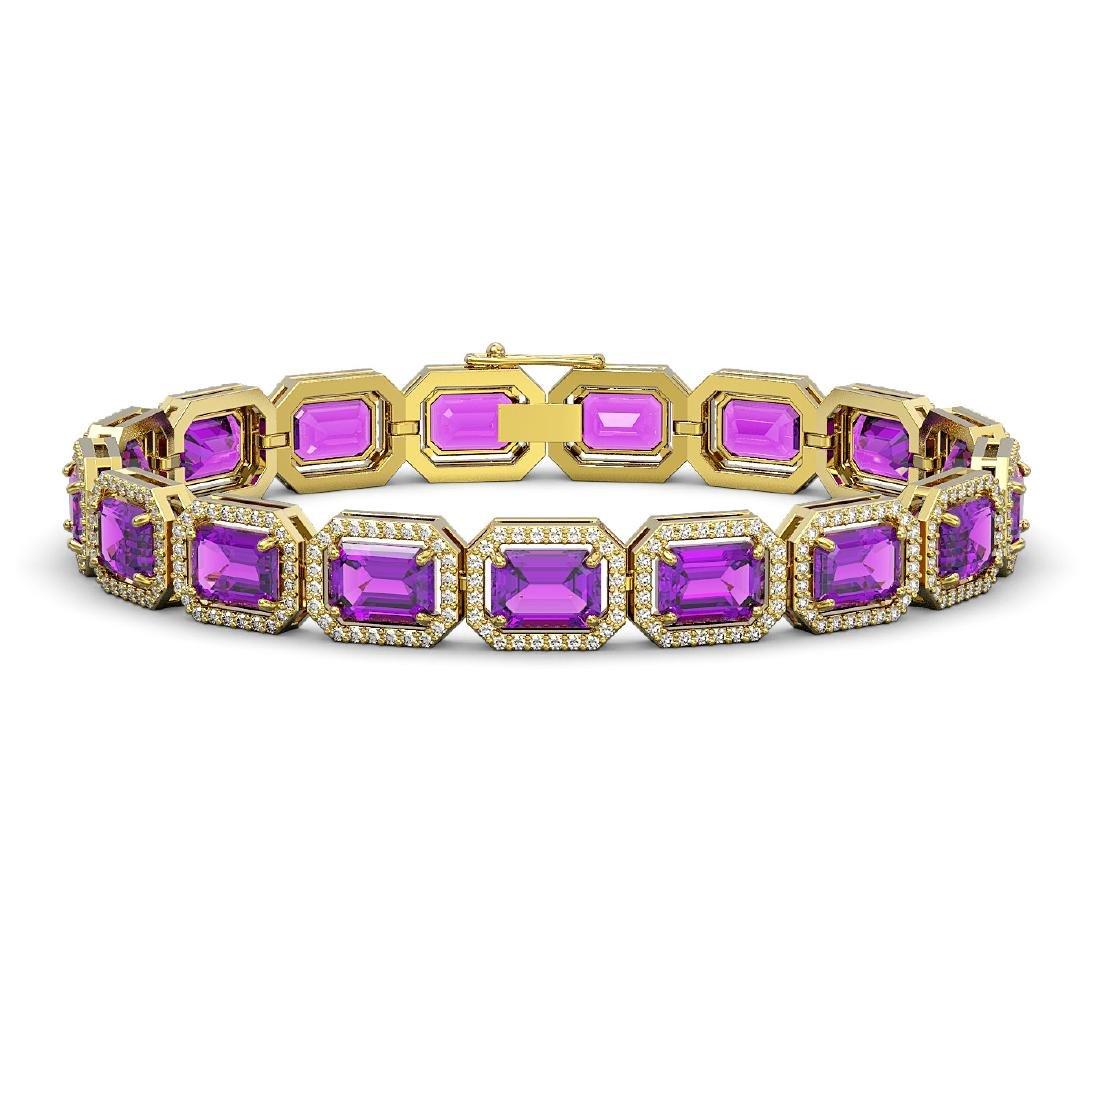 22.81 CTW Amethyst & Diamond Halo Bracelet 10K Yellow